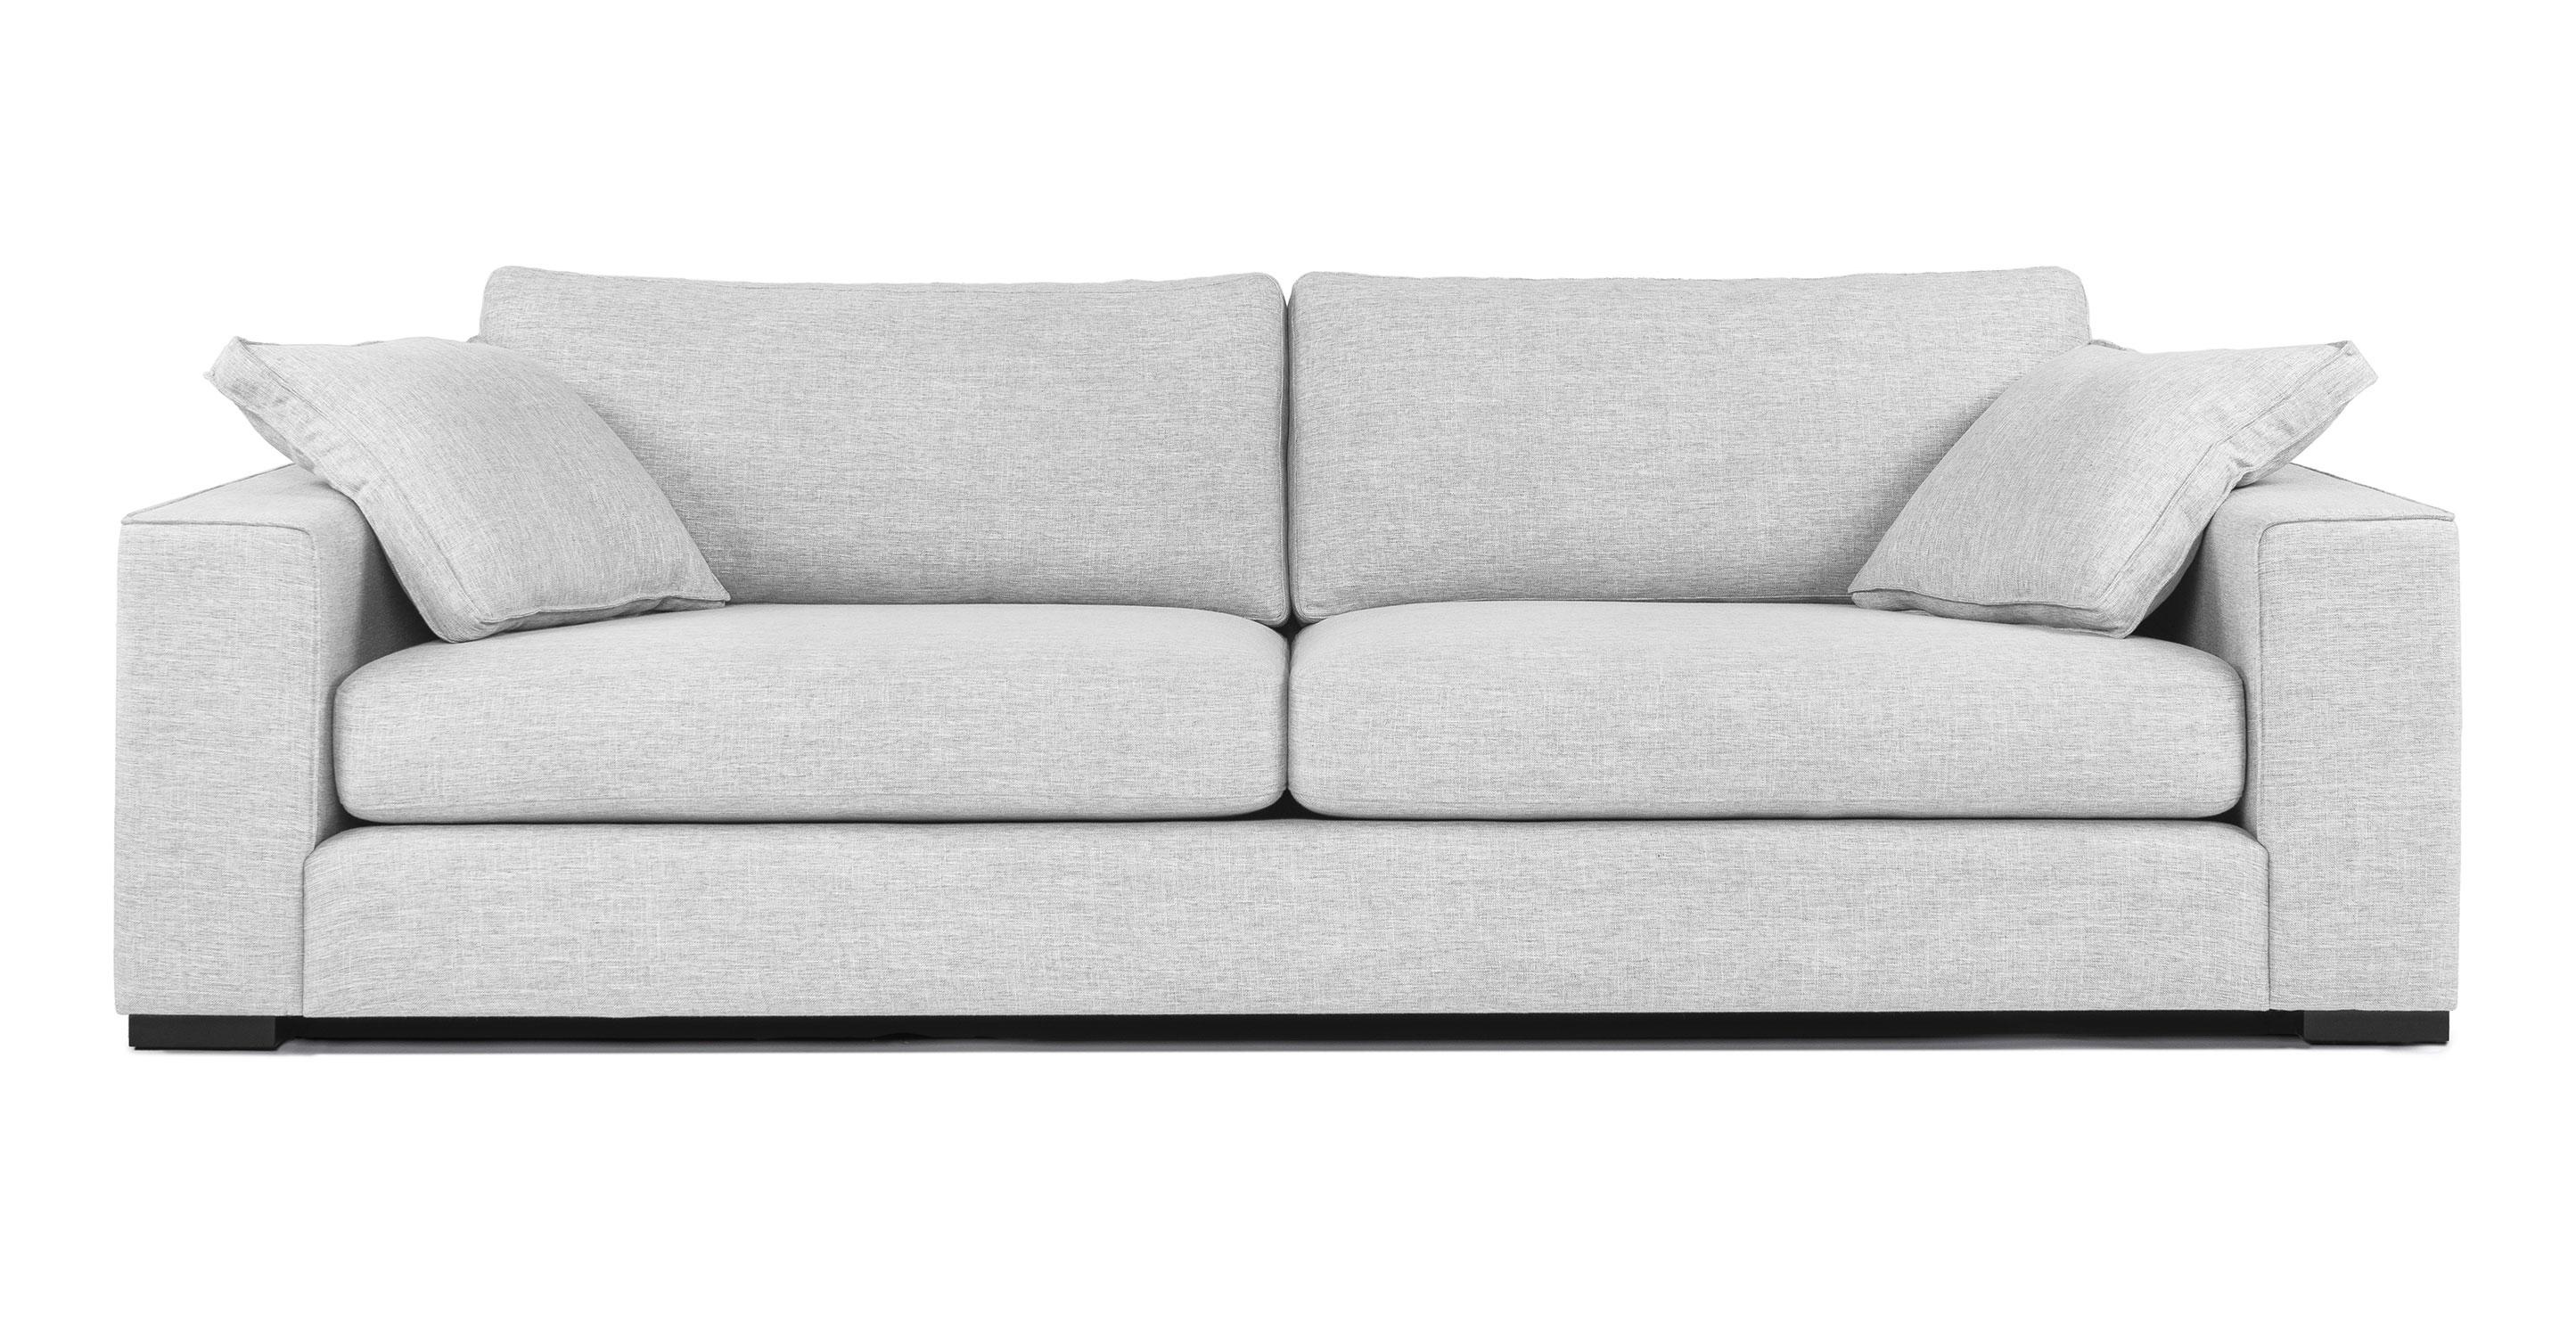 sitka mist gray sofa